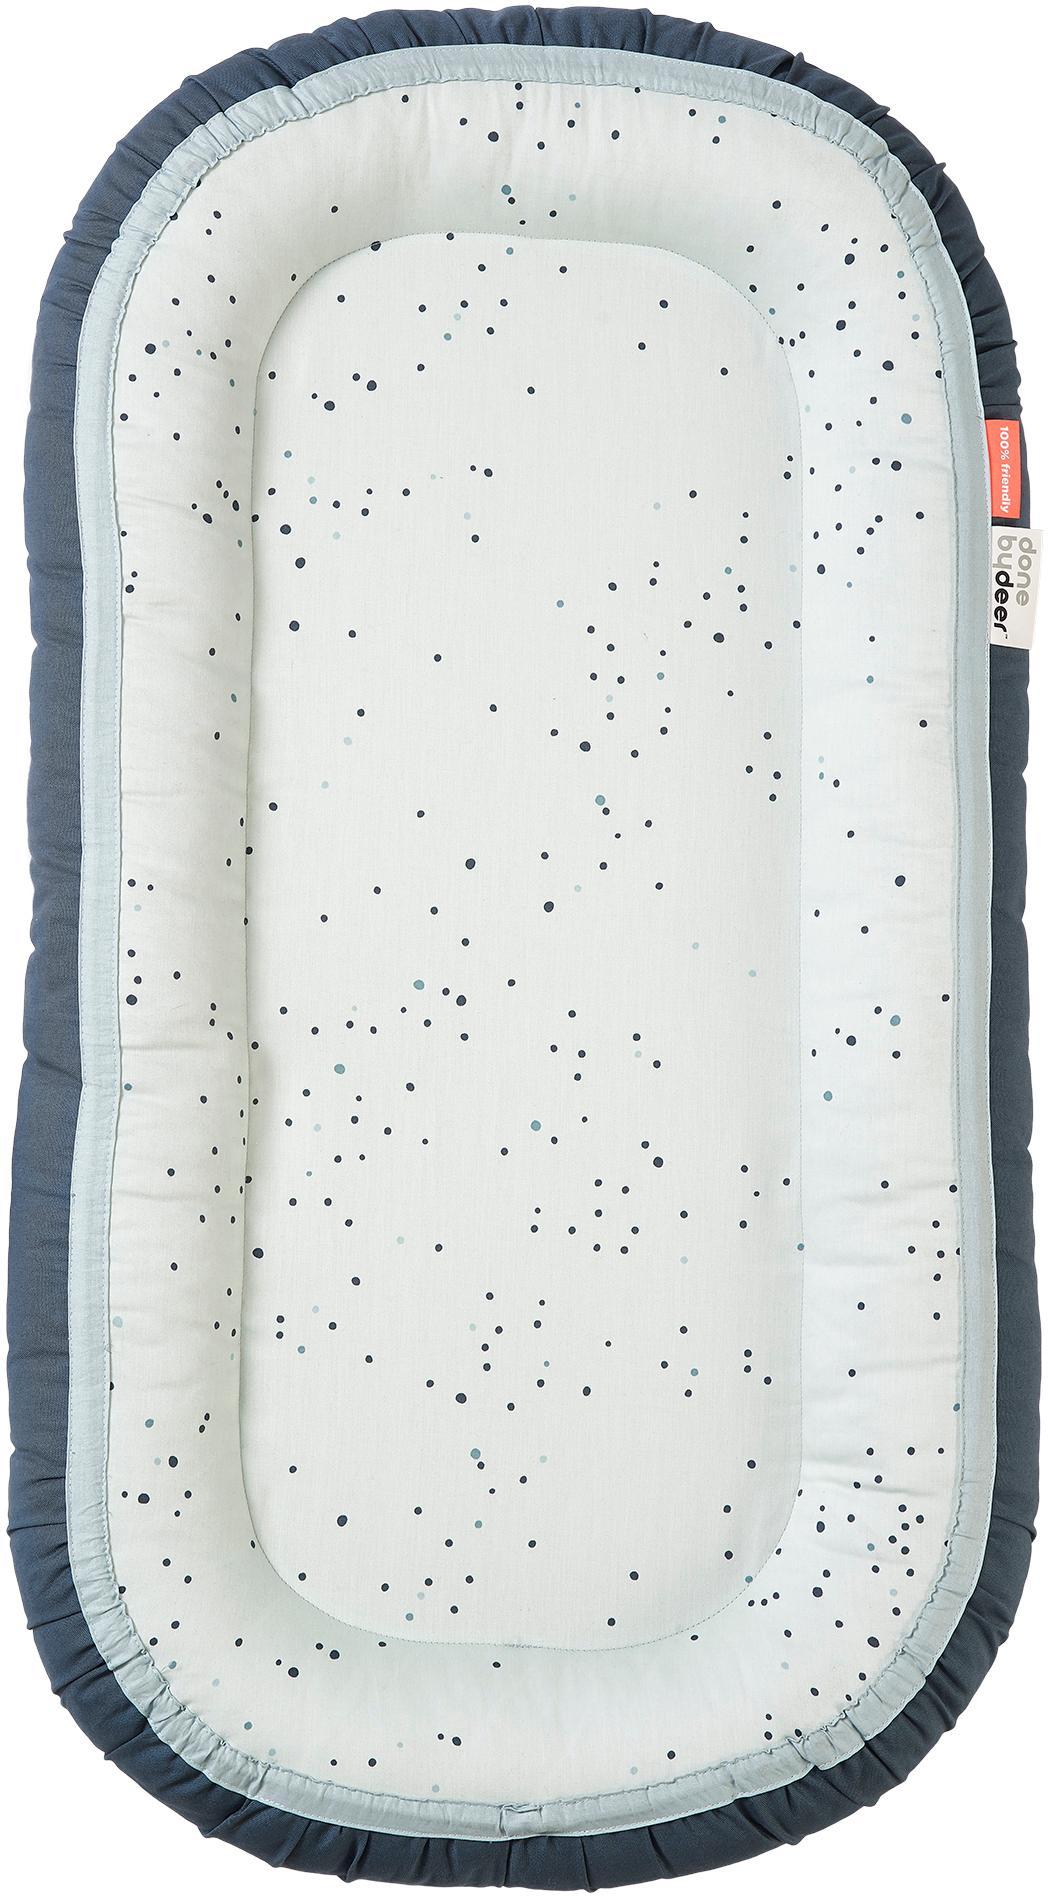 Babynest Dreamy Dots, Bezug: 100% Baumwolle, Oeko-Tex-, Matratze: 100% PU-Schaumstoff, Blau, 50 x 93 cm